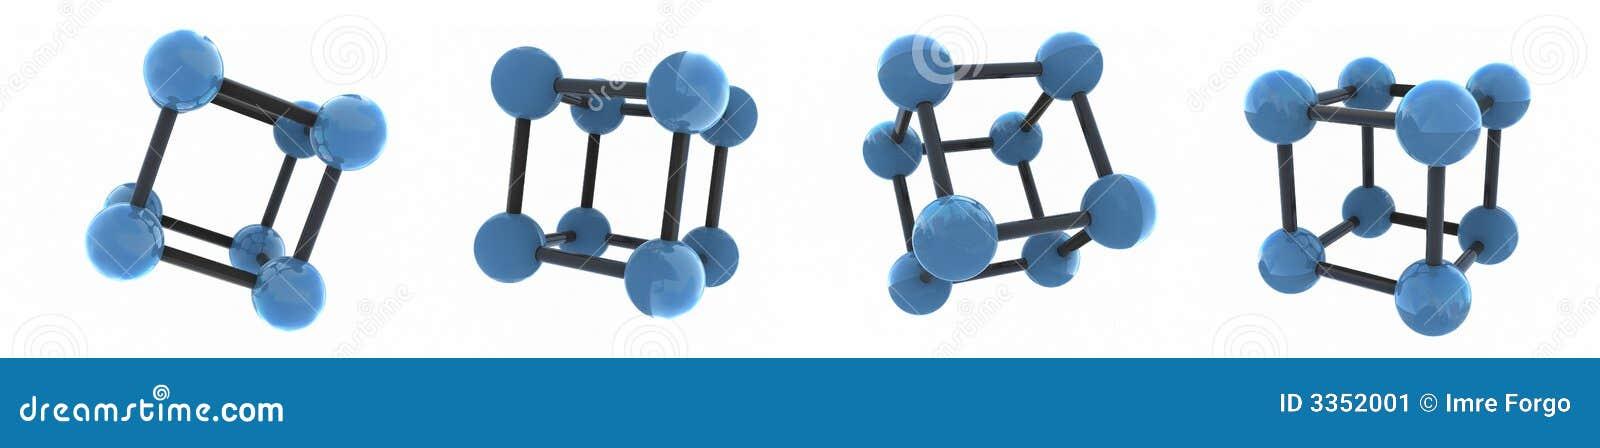 Moléculas isoladas